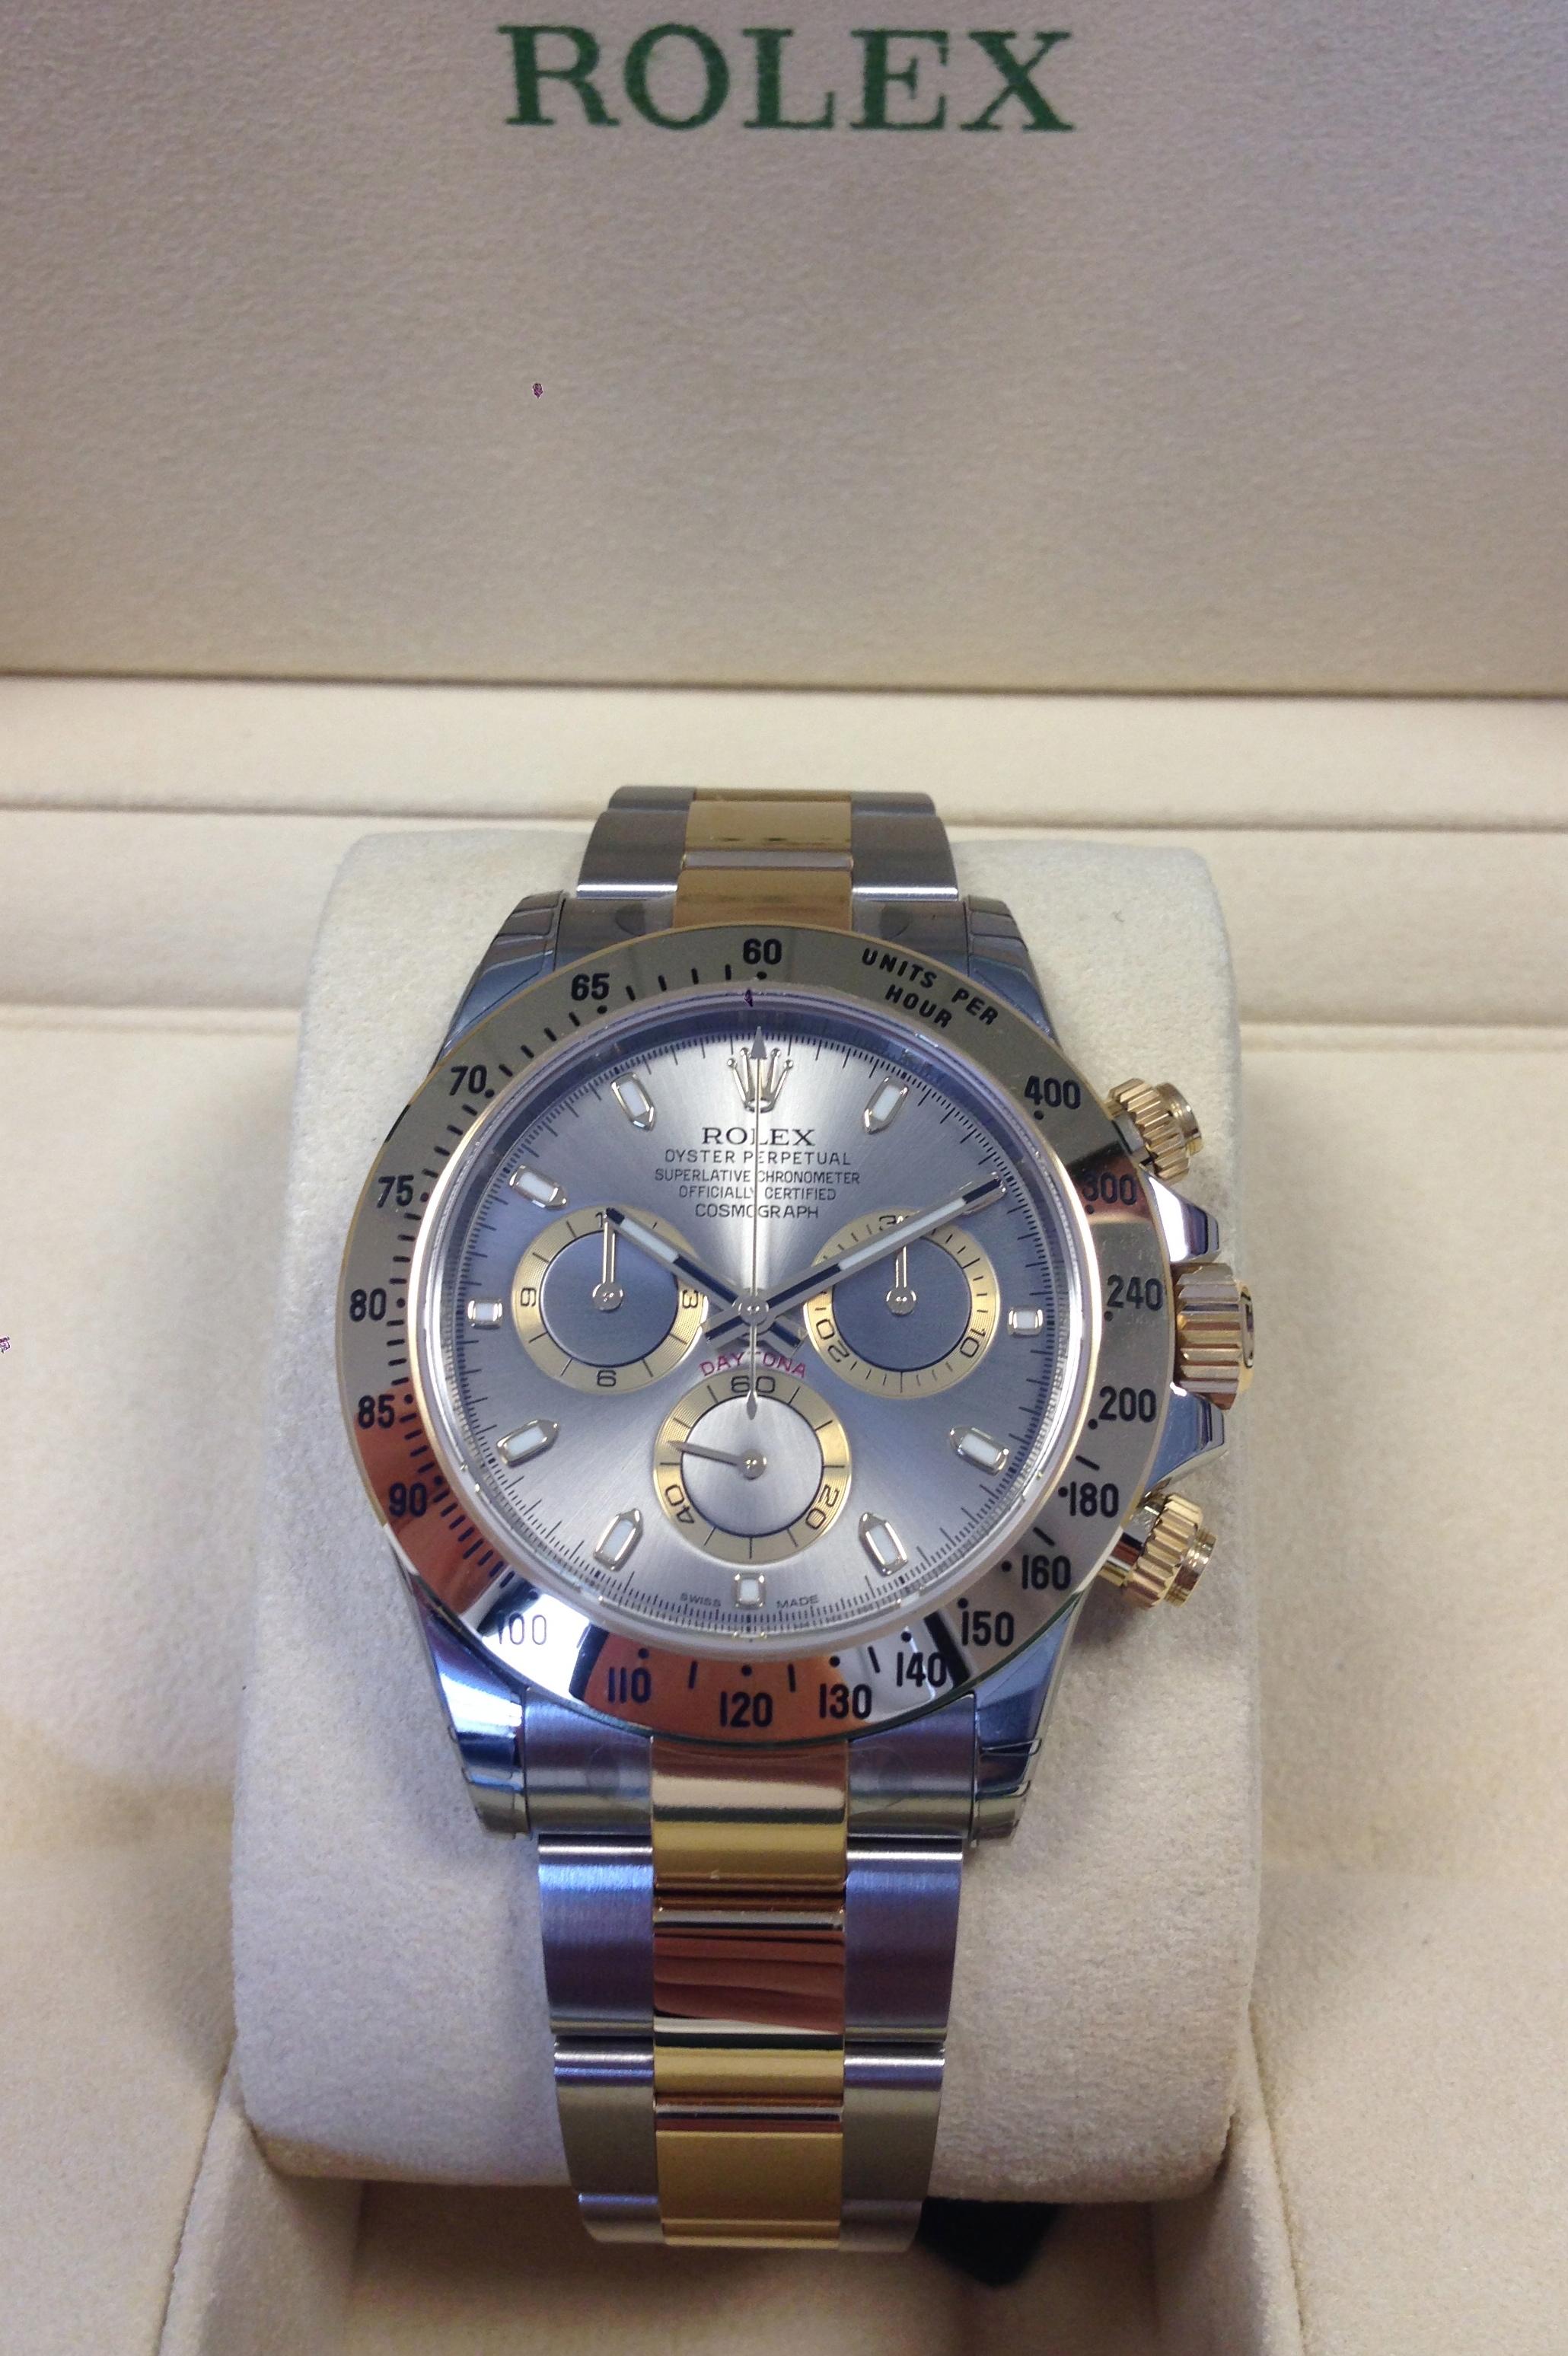 4ba3f0fc367 Cosmograph Daytona | Rolex | 116503